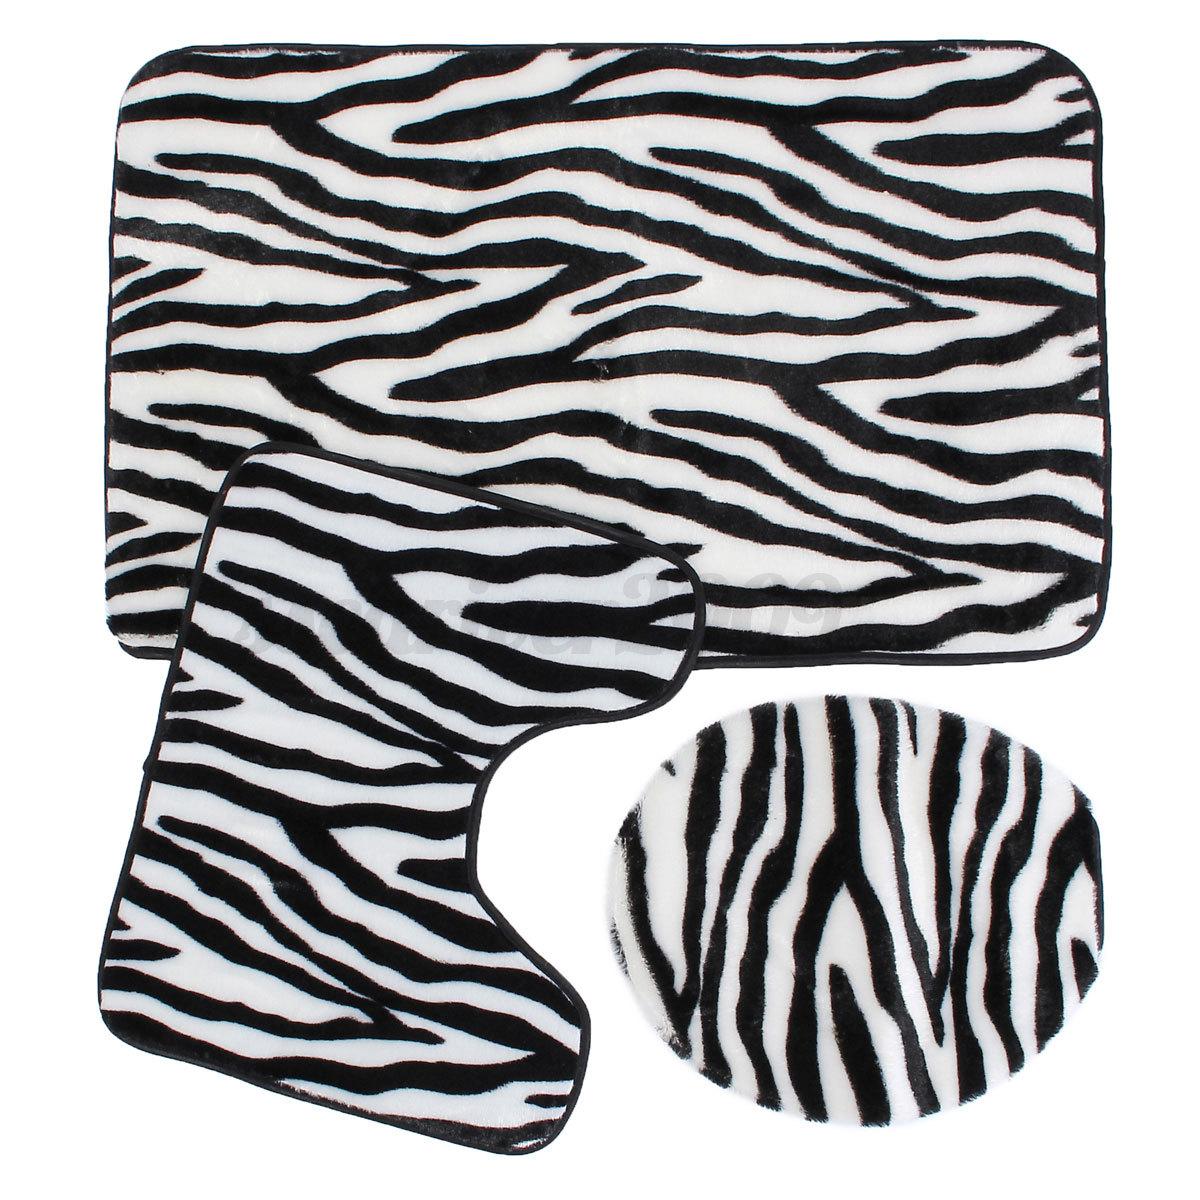 Zebra Leopard Print Set 3 Toilet Seat Cover Bathroom Mat